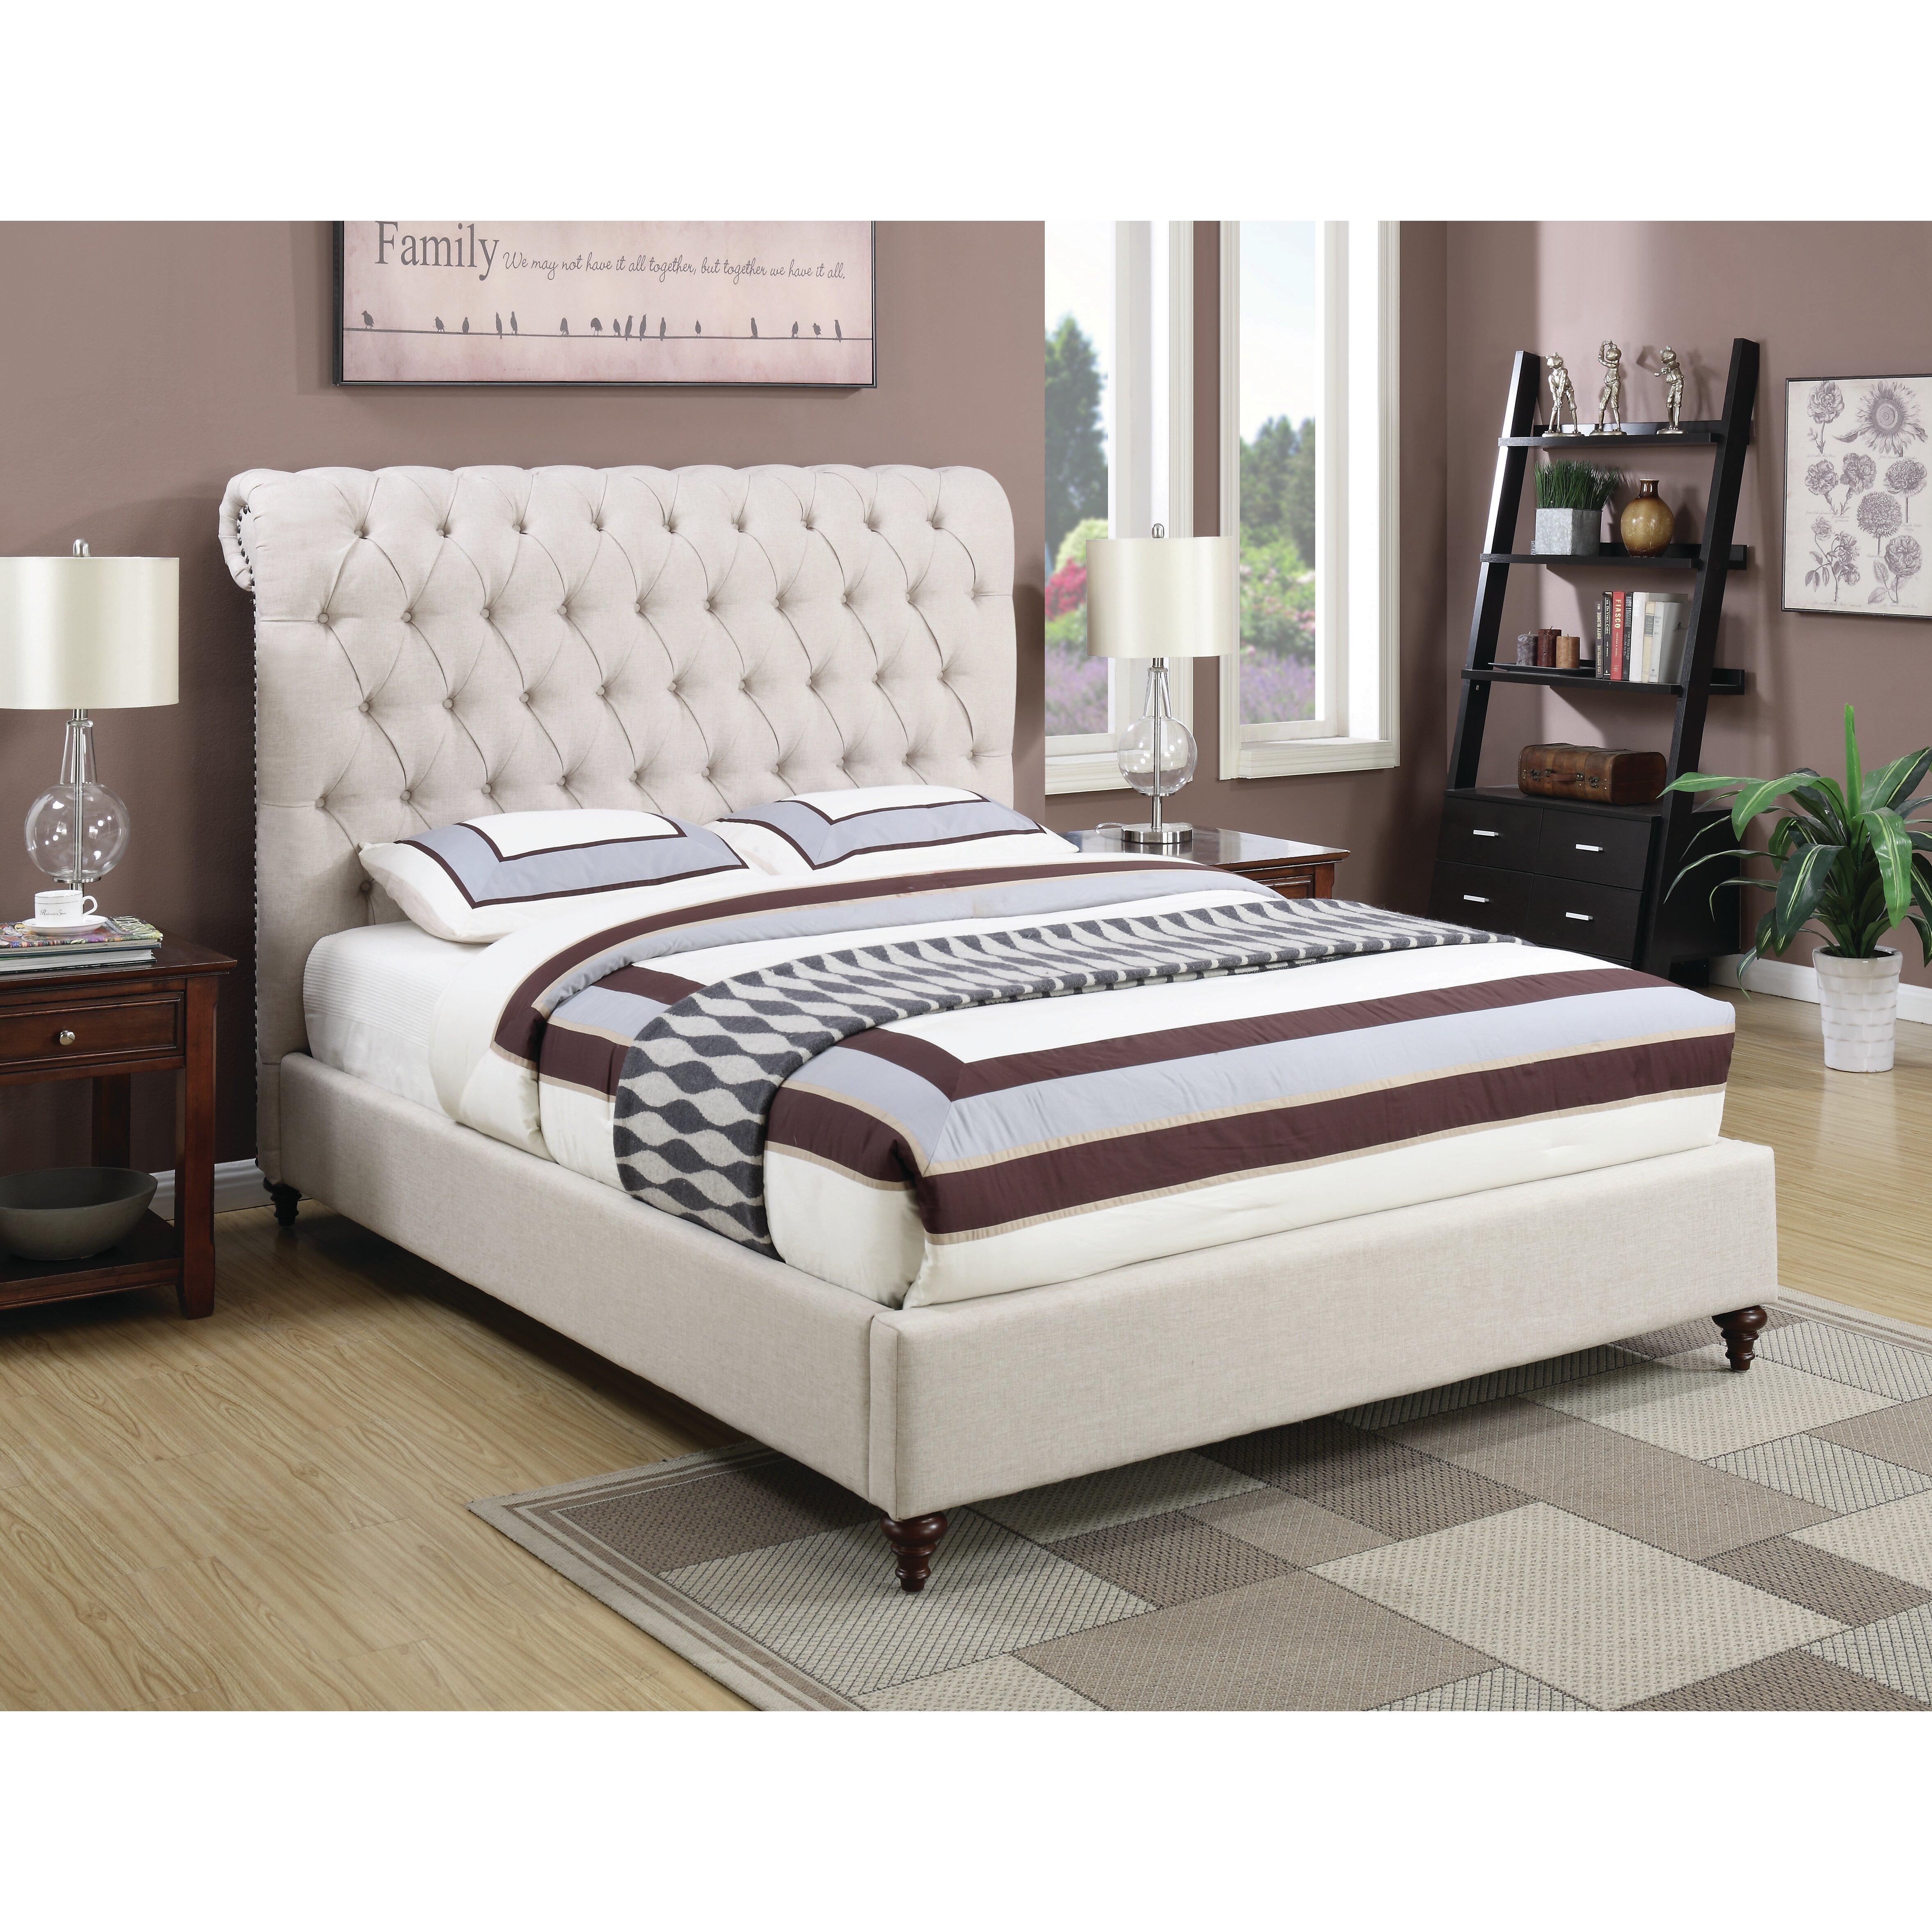 House of hampton hunstanton upholstered sleigh bed for House of hampton bedding